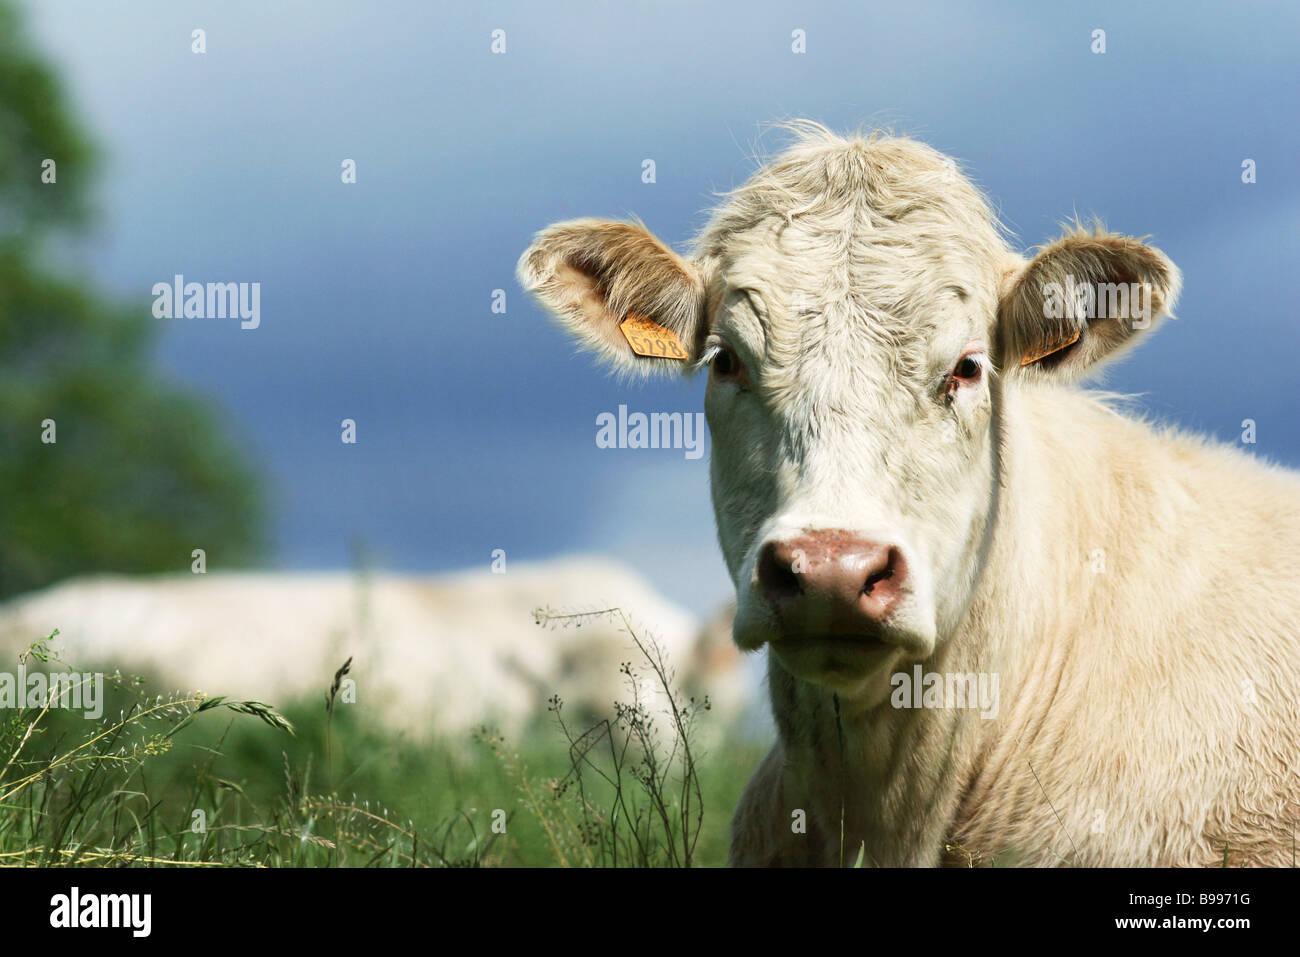 Vacca bianca in pascolo, close-up Immagini Stock